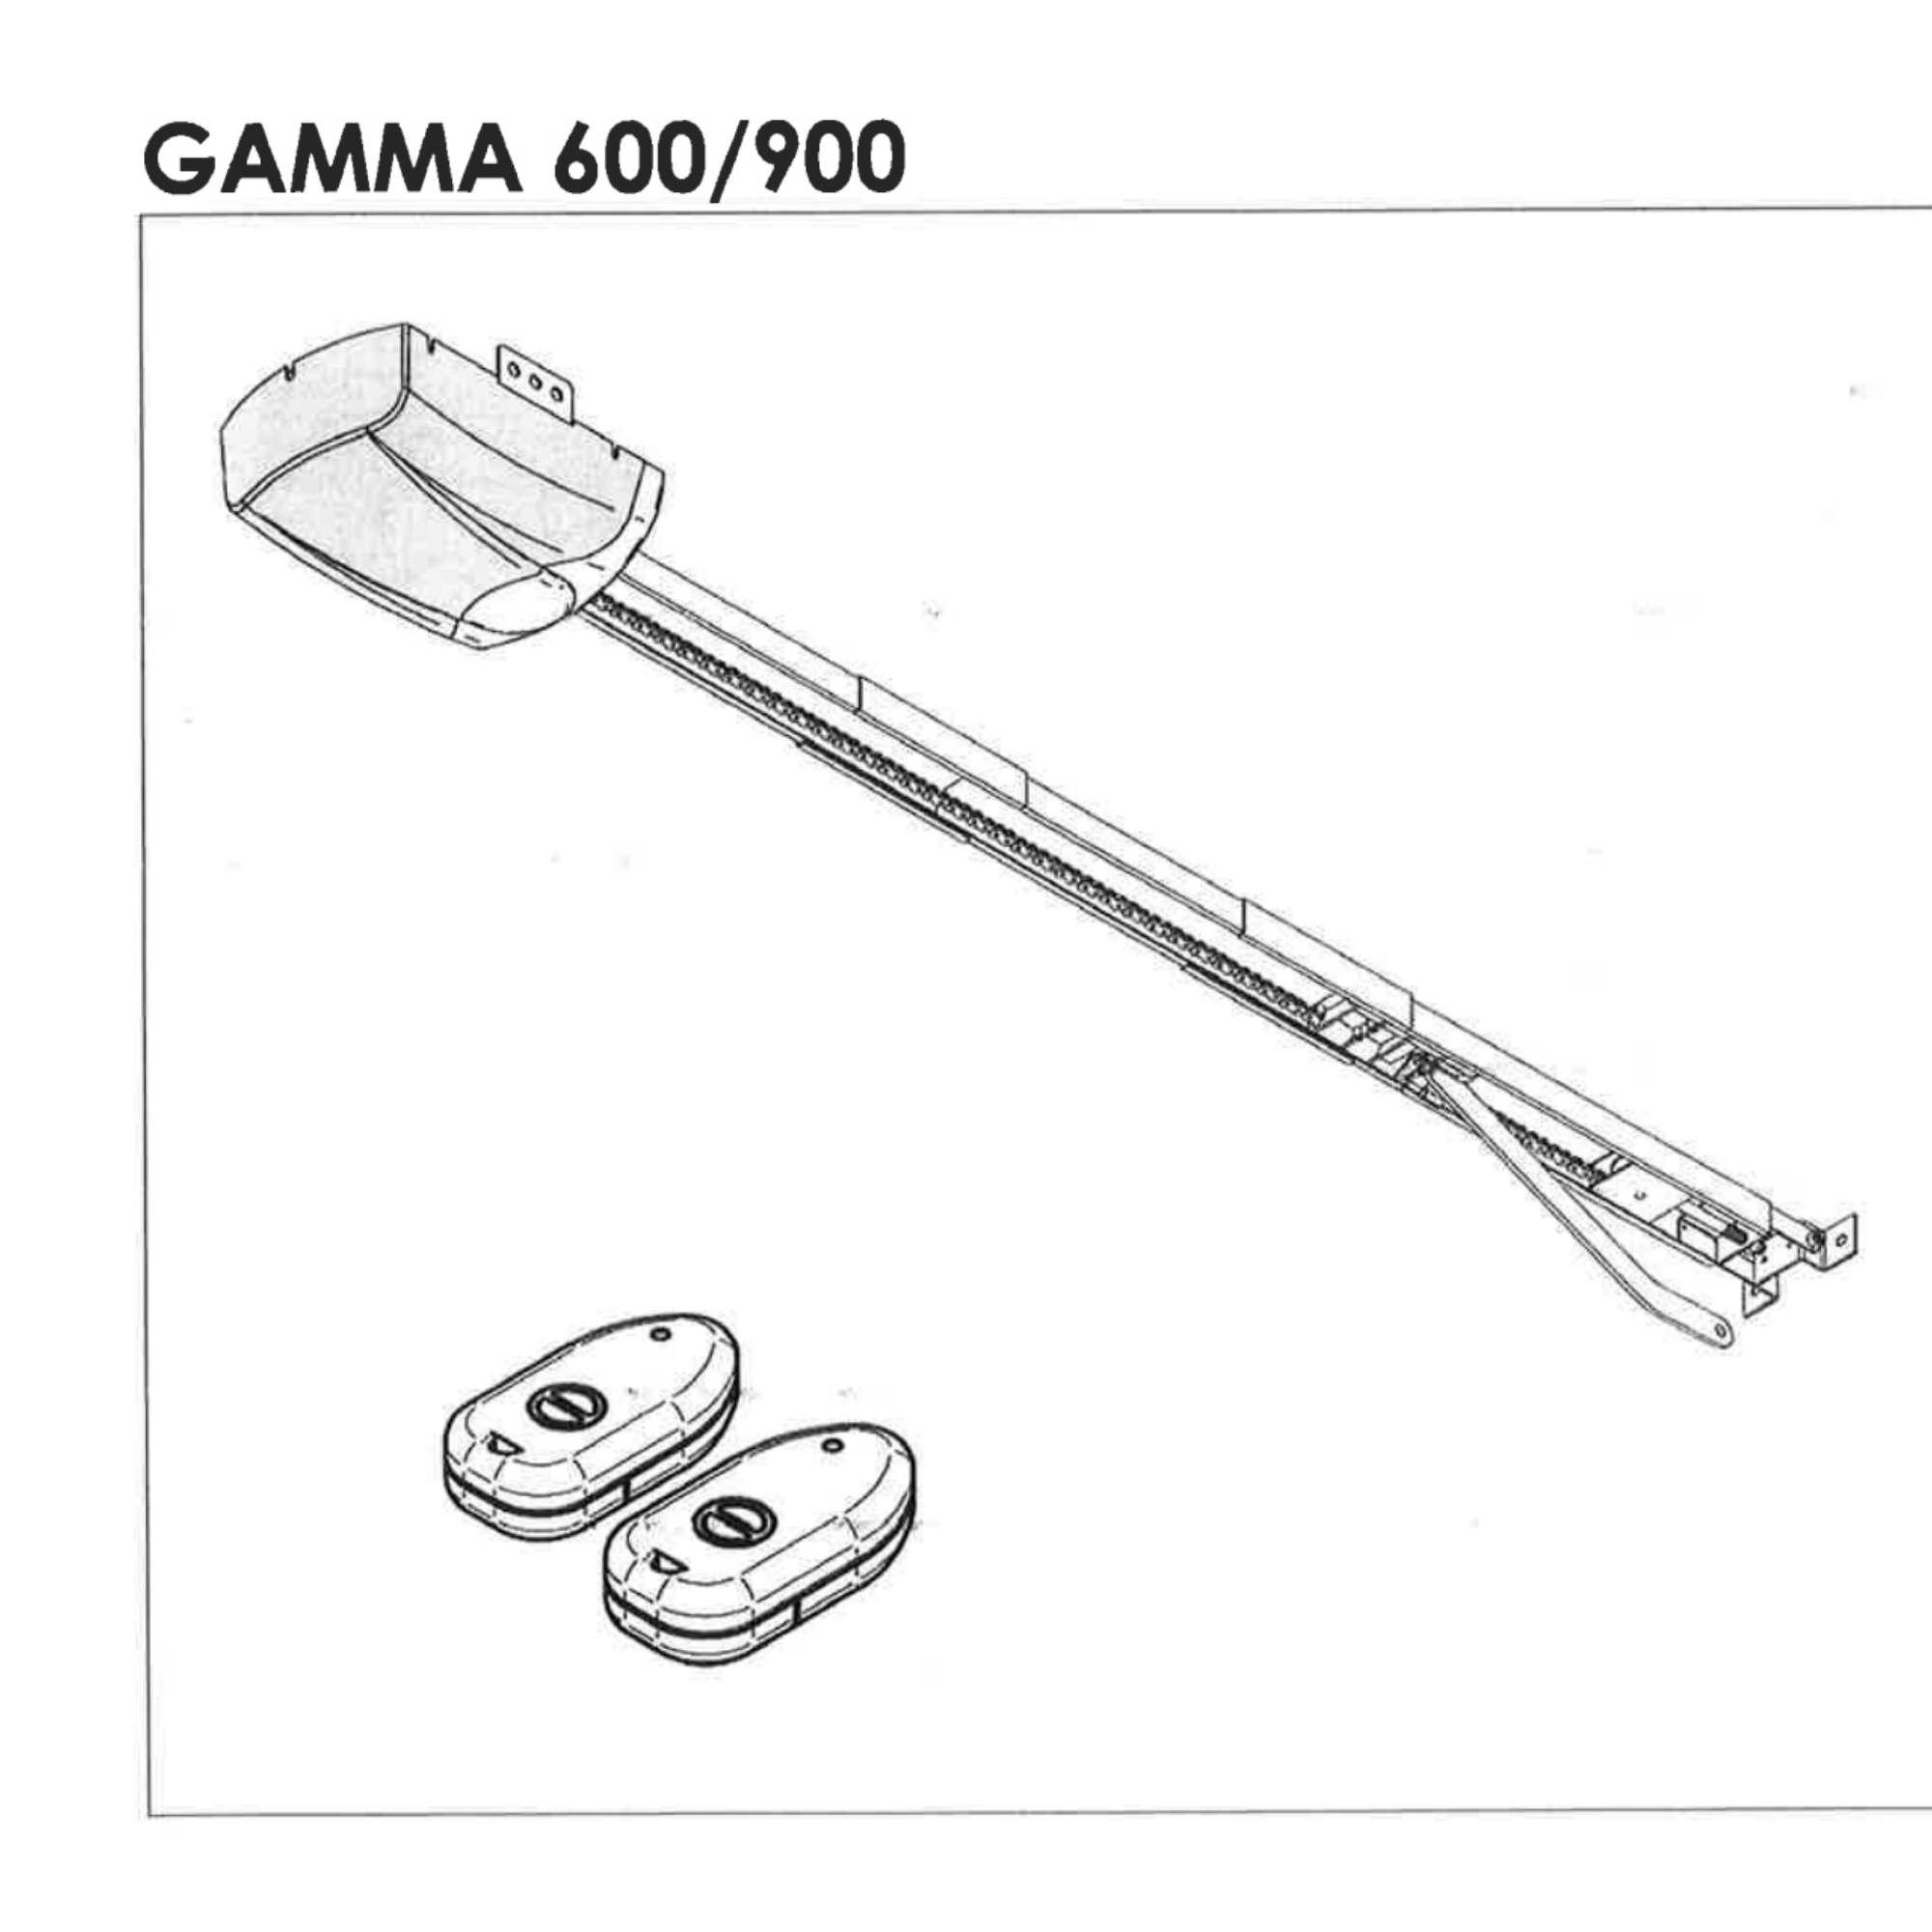 Monteringsanvisning til portåpner Gamma 600/900